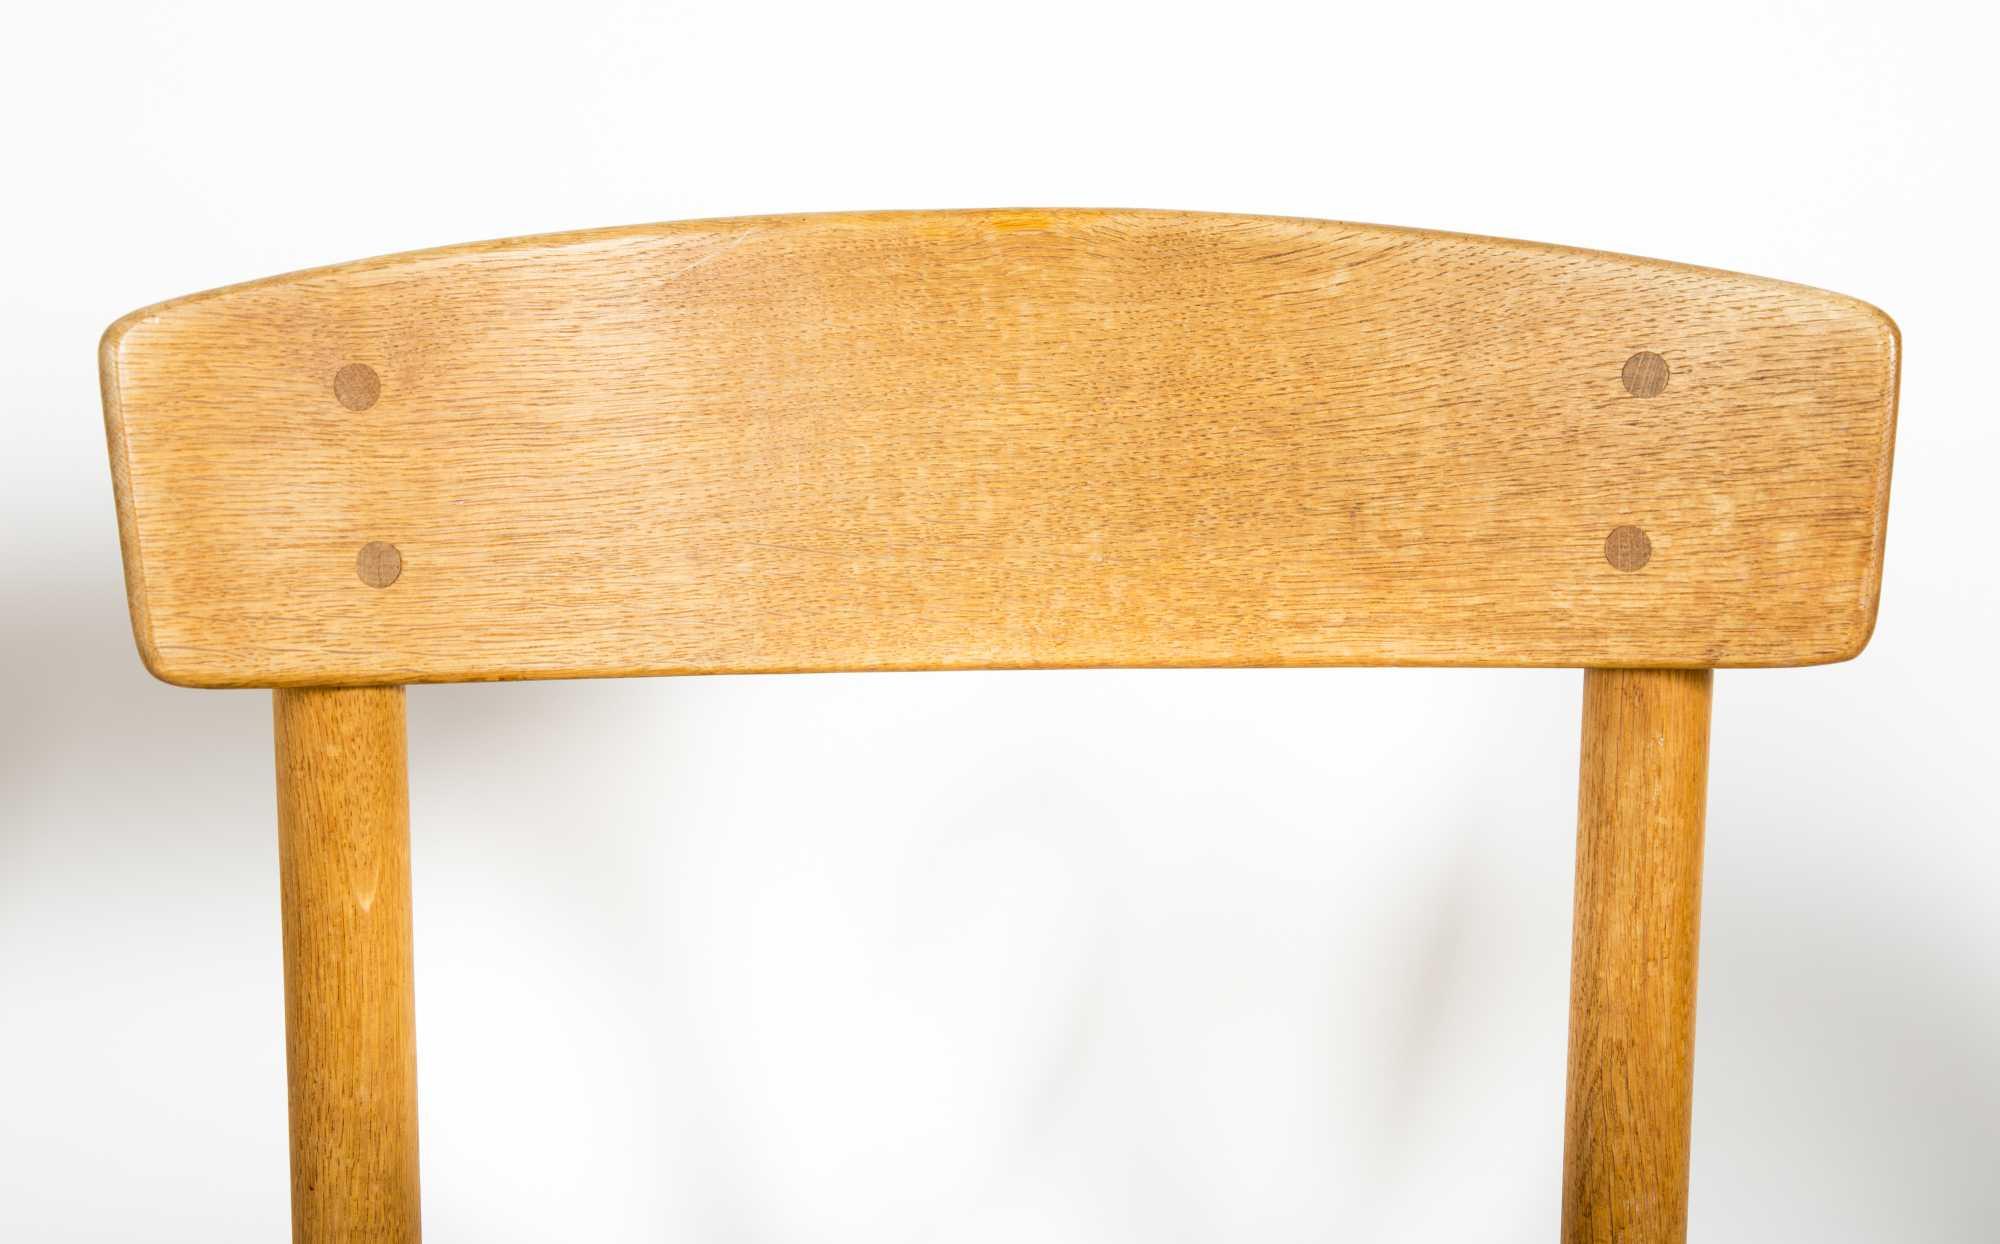 Sensational Danish Modern Reverse Top Game Table And Four Chairs Creativecarmelina Interior Chair Design Creativecarmelinacom